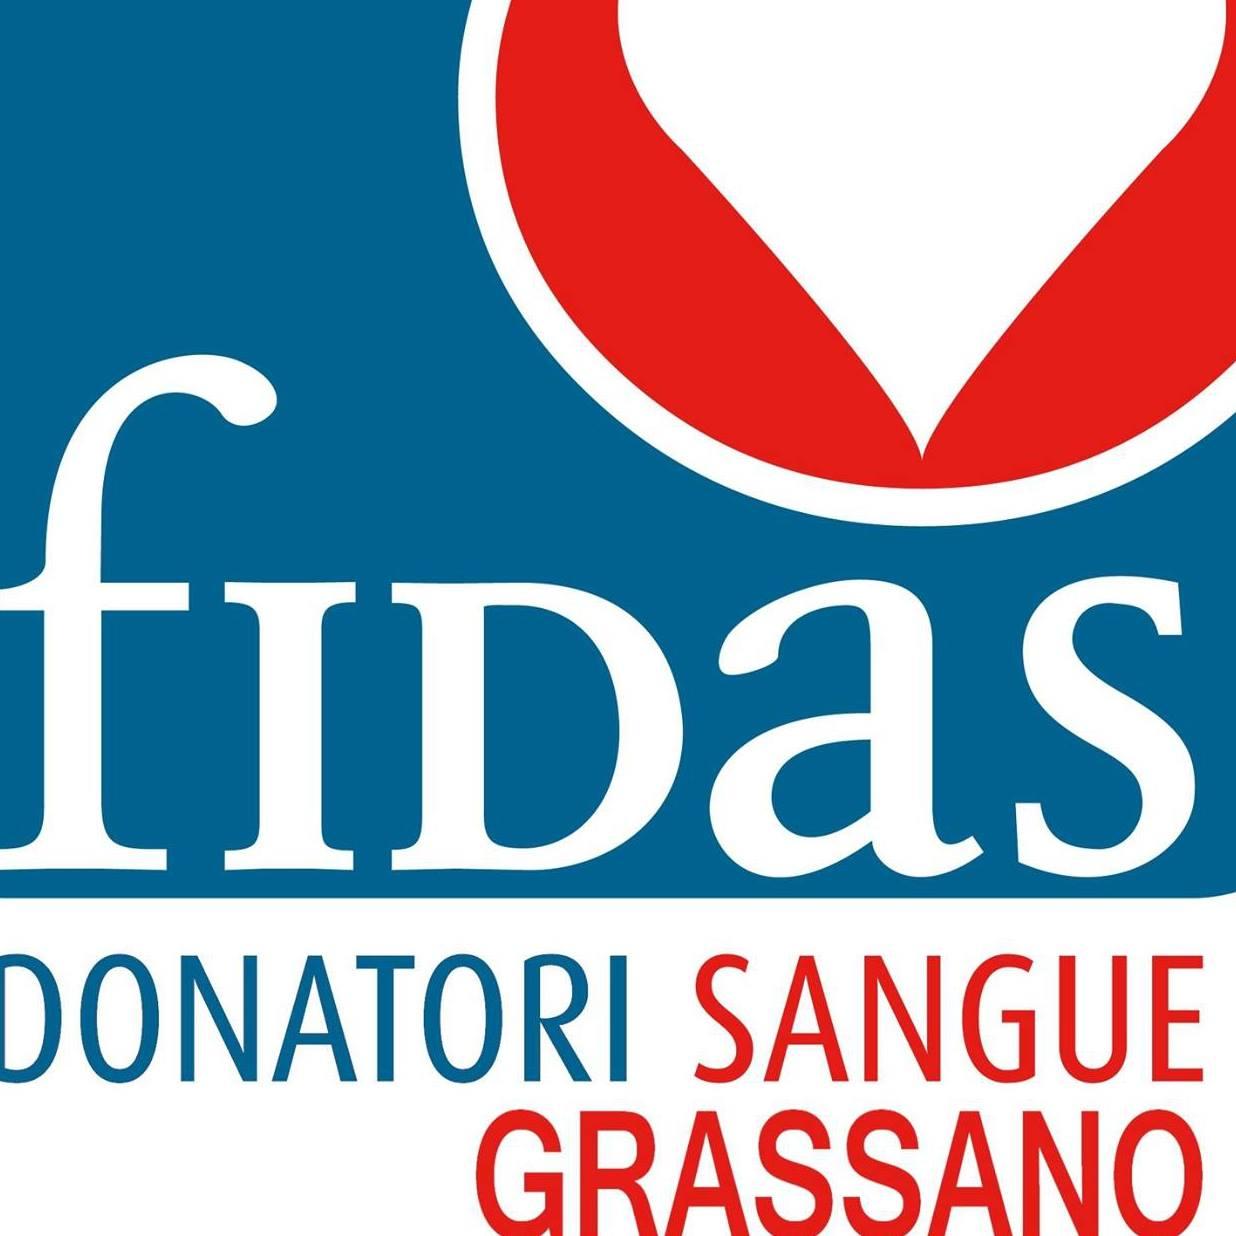 Fidas Grassano